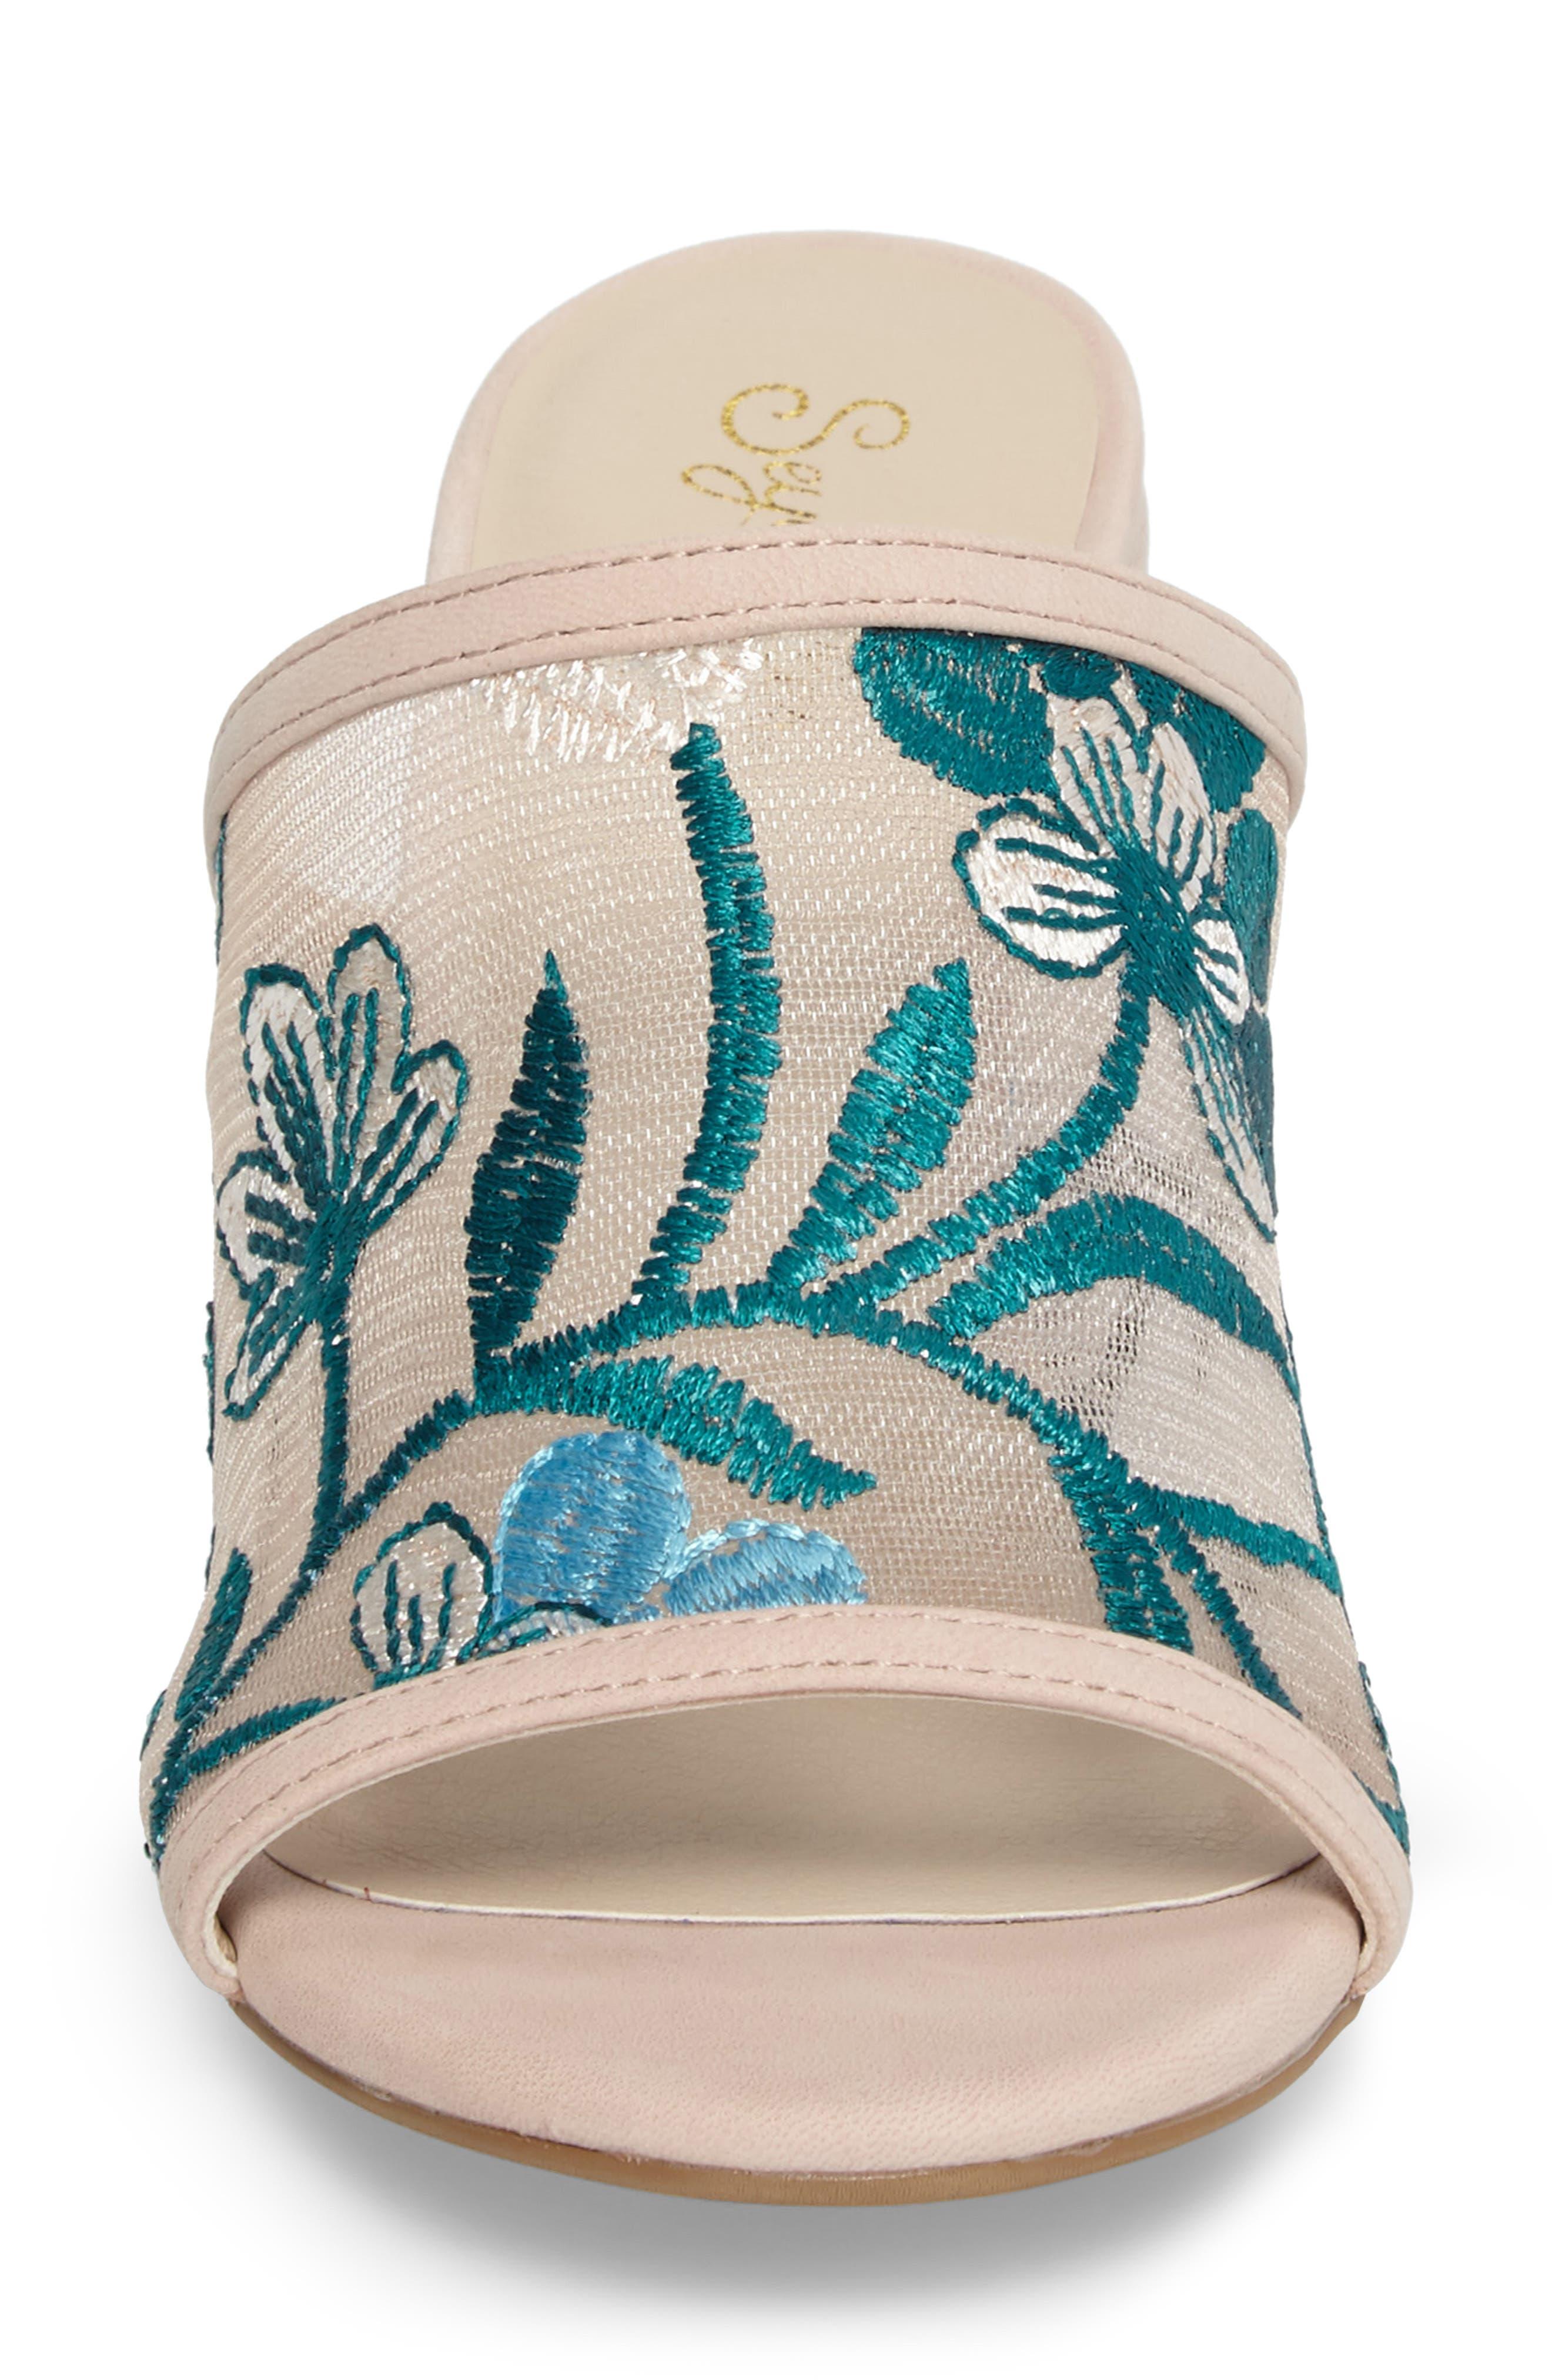 Nursery Block Heel Sandal,                             Alternate thumbnail 4, color,                             650